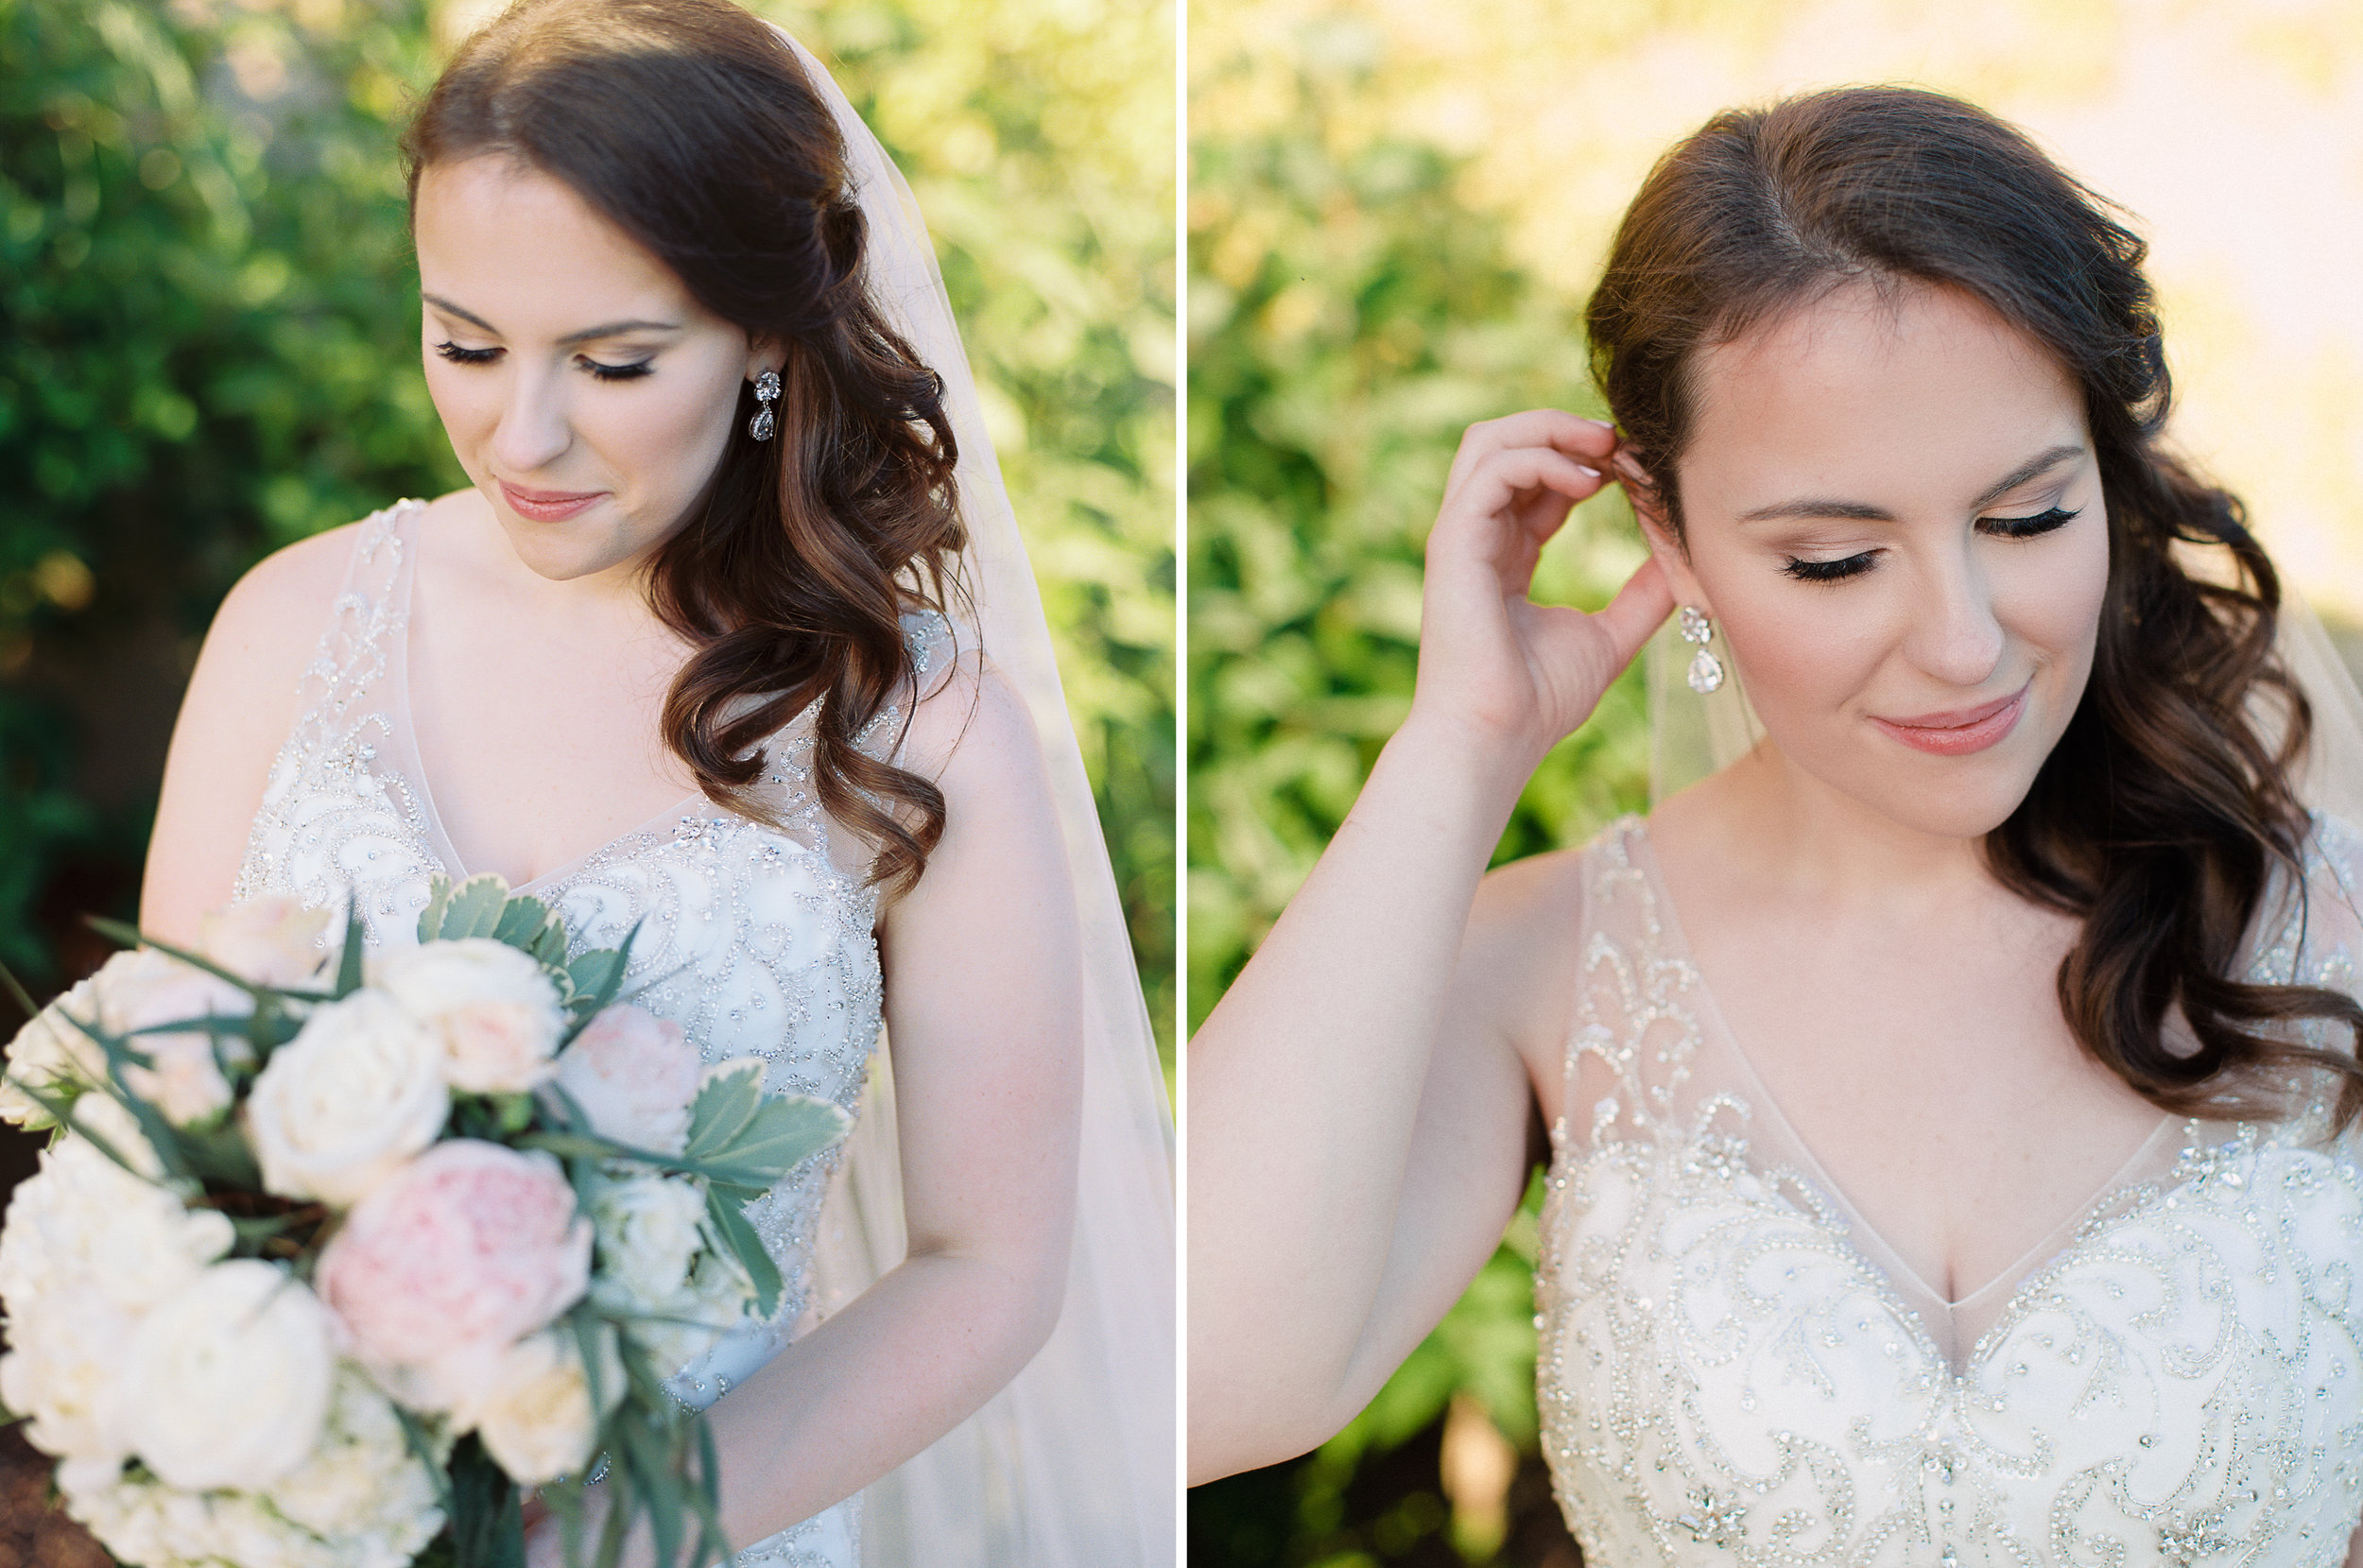 romantic-willamette-valley-vineyard-wedding-20.jpg